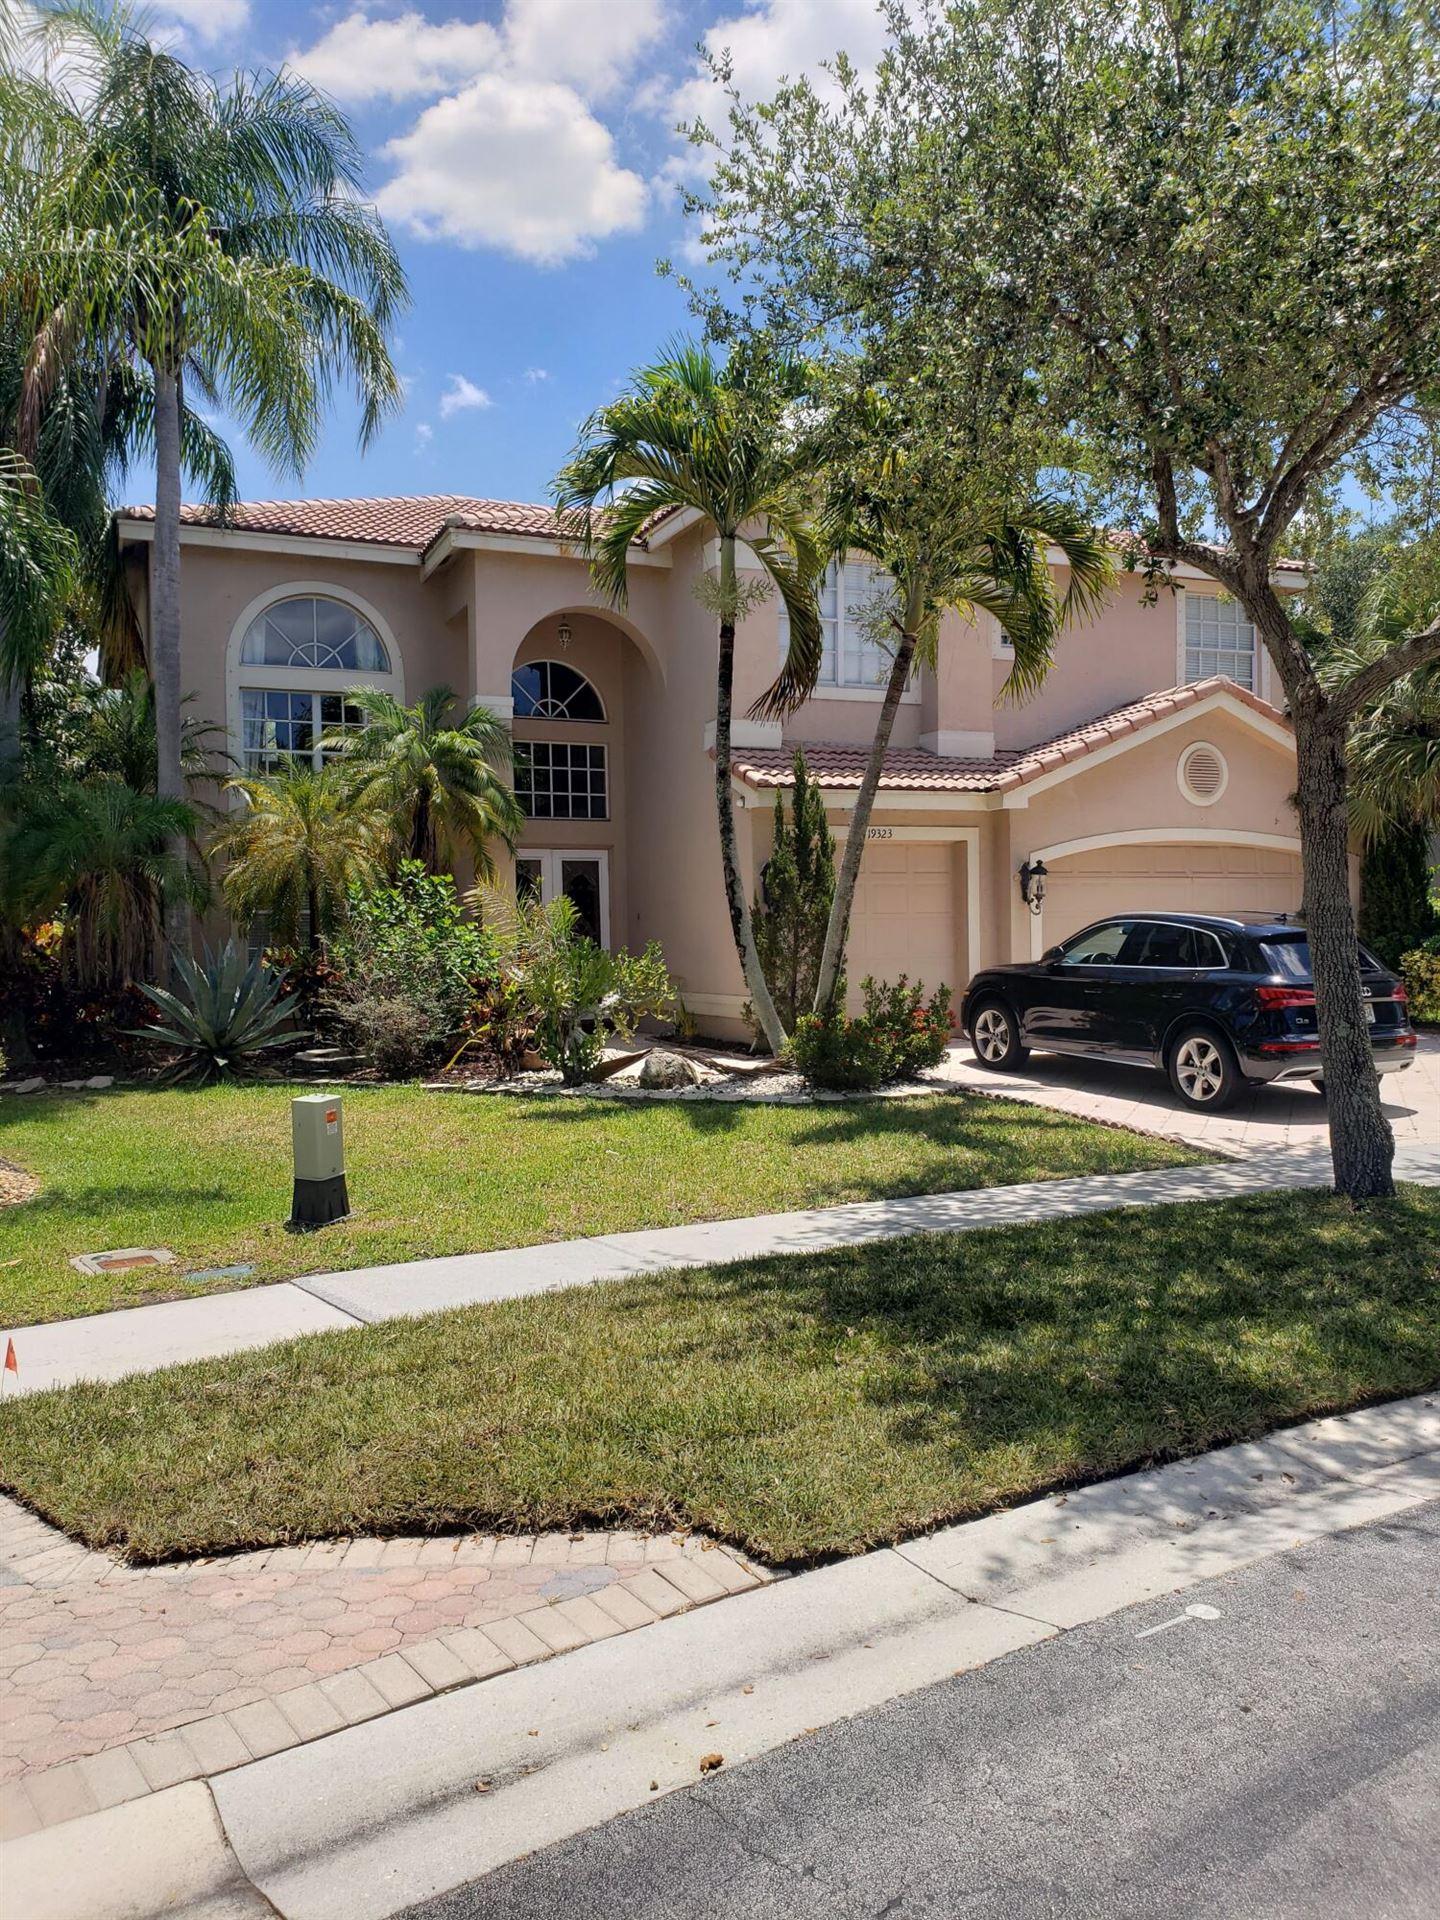 19323 Skyridge Circle, Boca Raton, FL 33498 - MLS#: RX-10752162